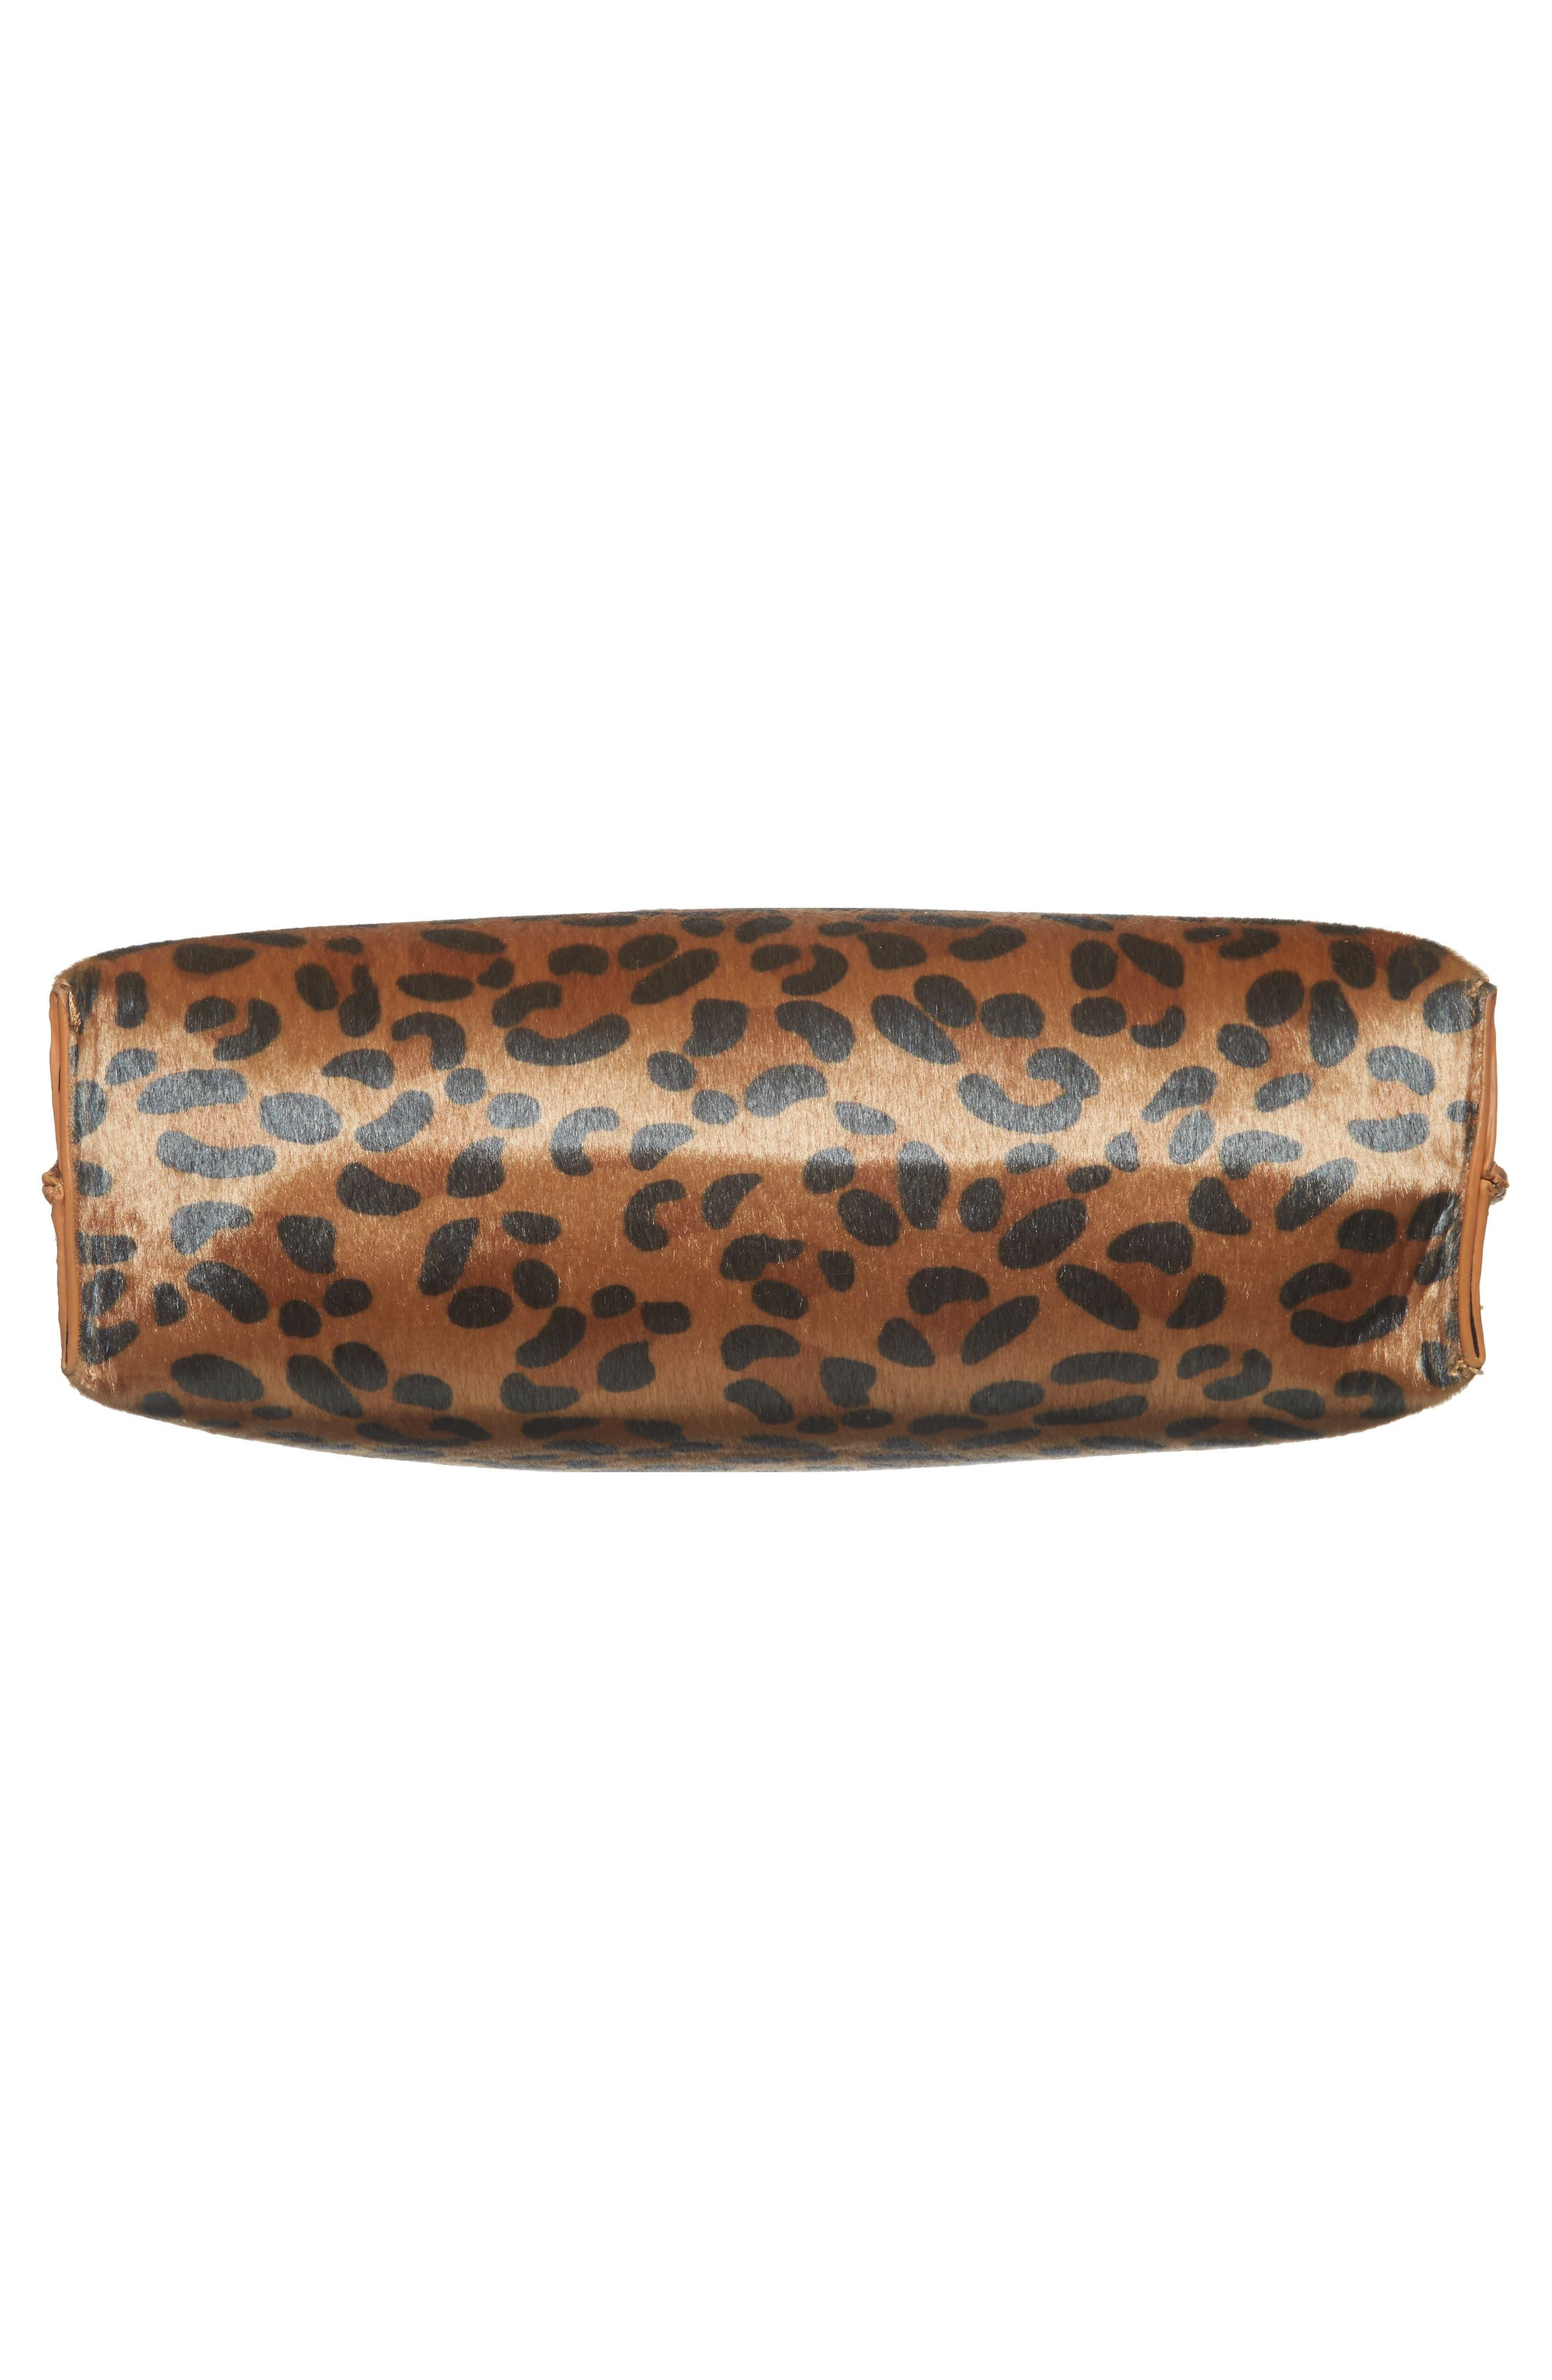 Leopard Print Faux Calf Hair Tote,                             Alternate thumbnail 6, color,                             201